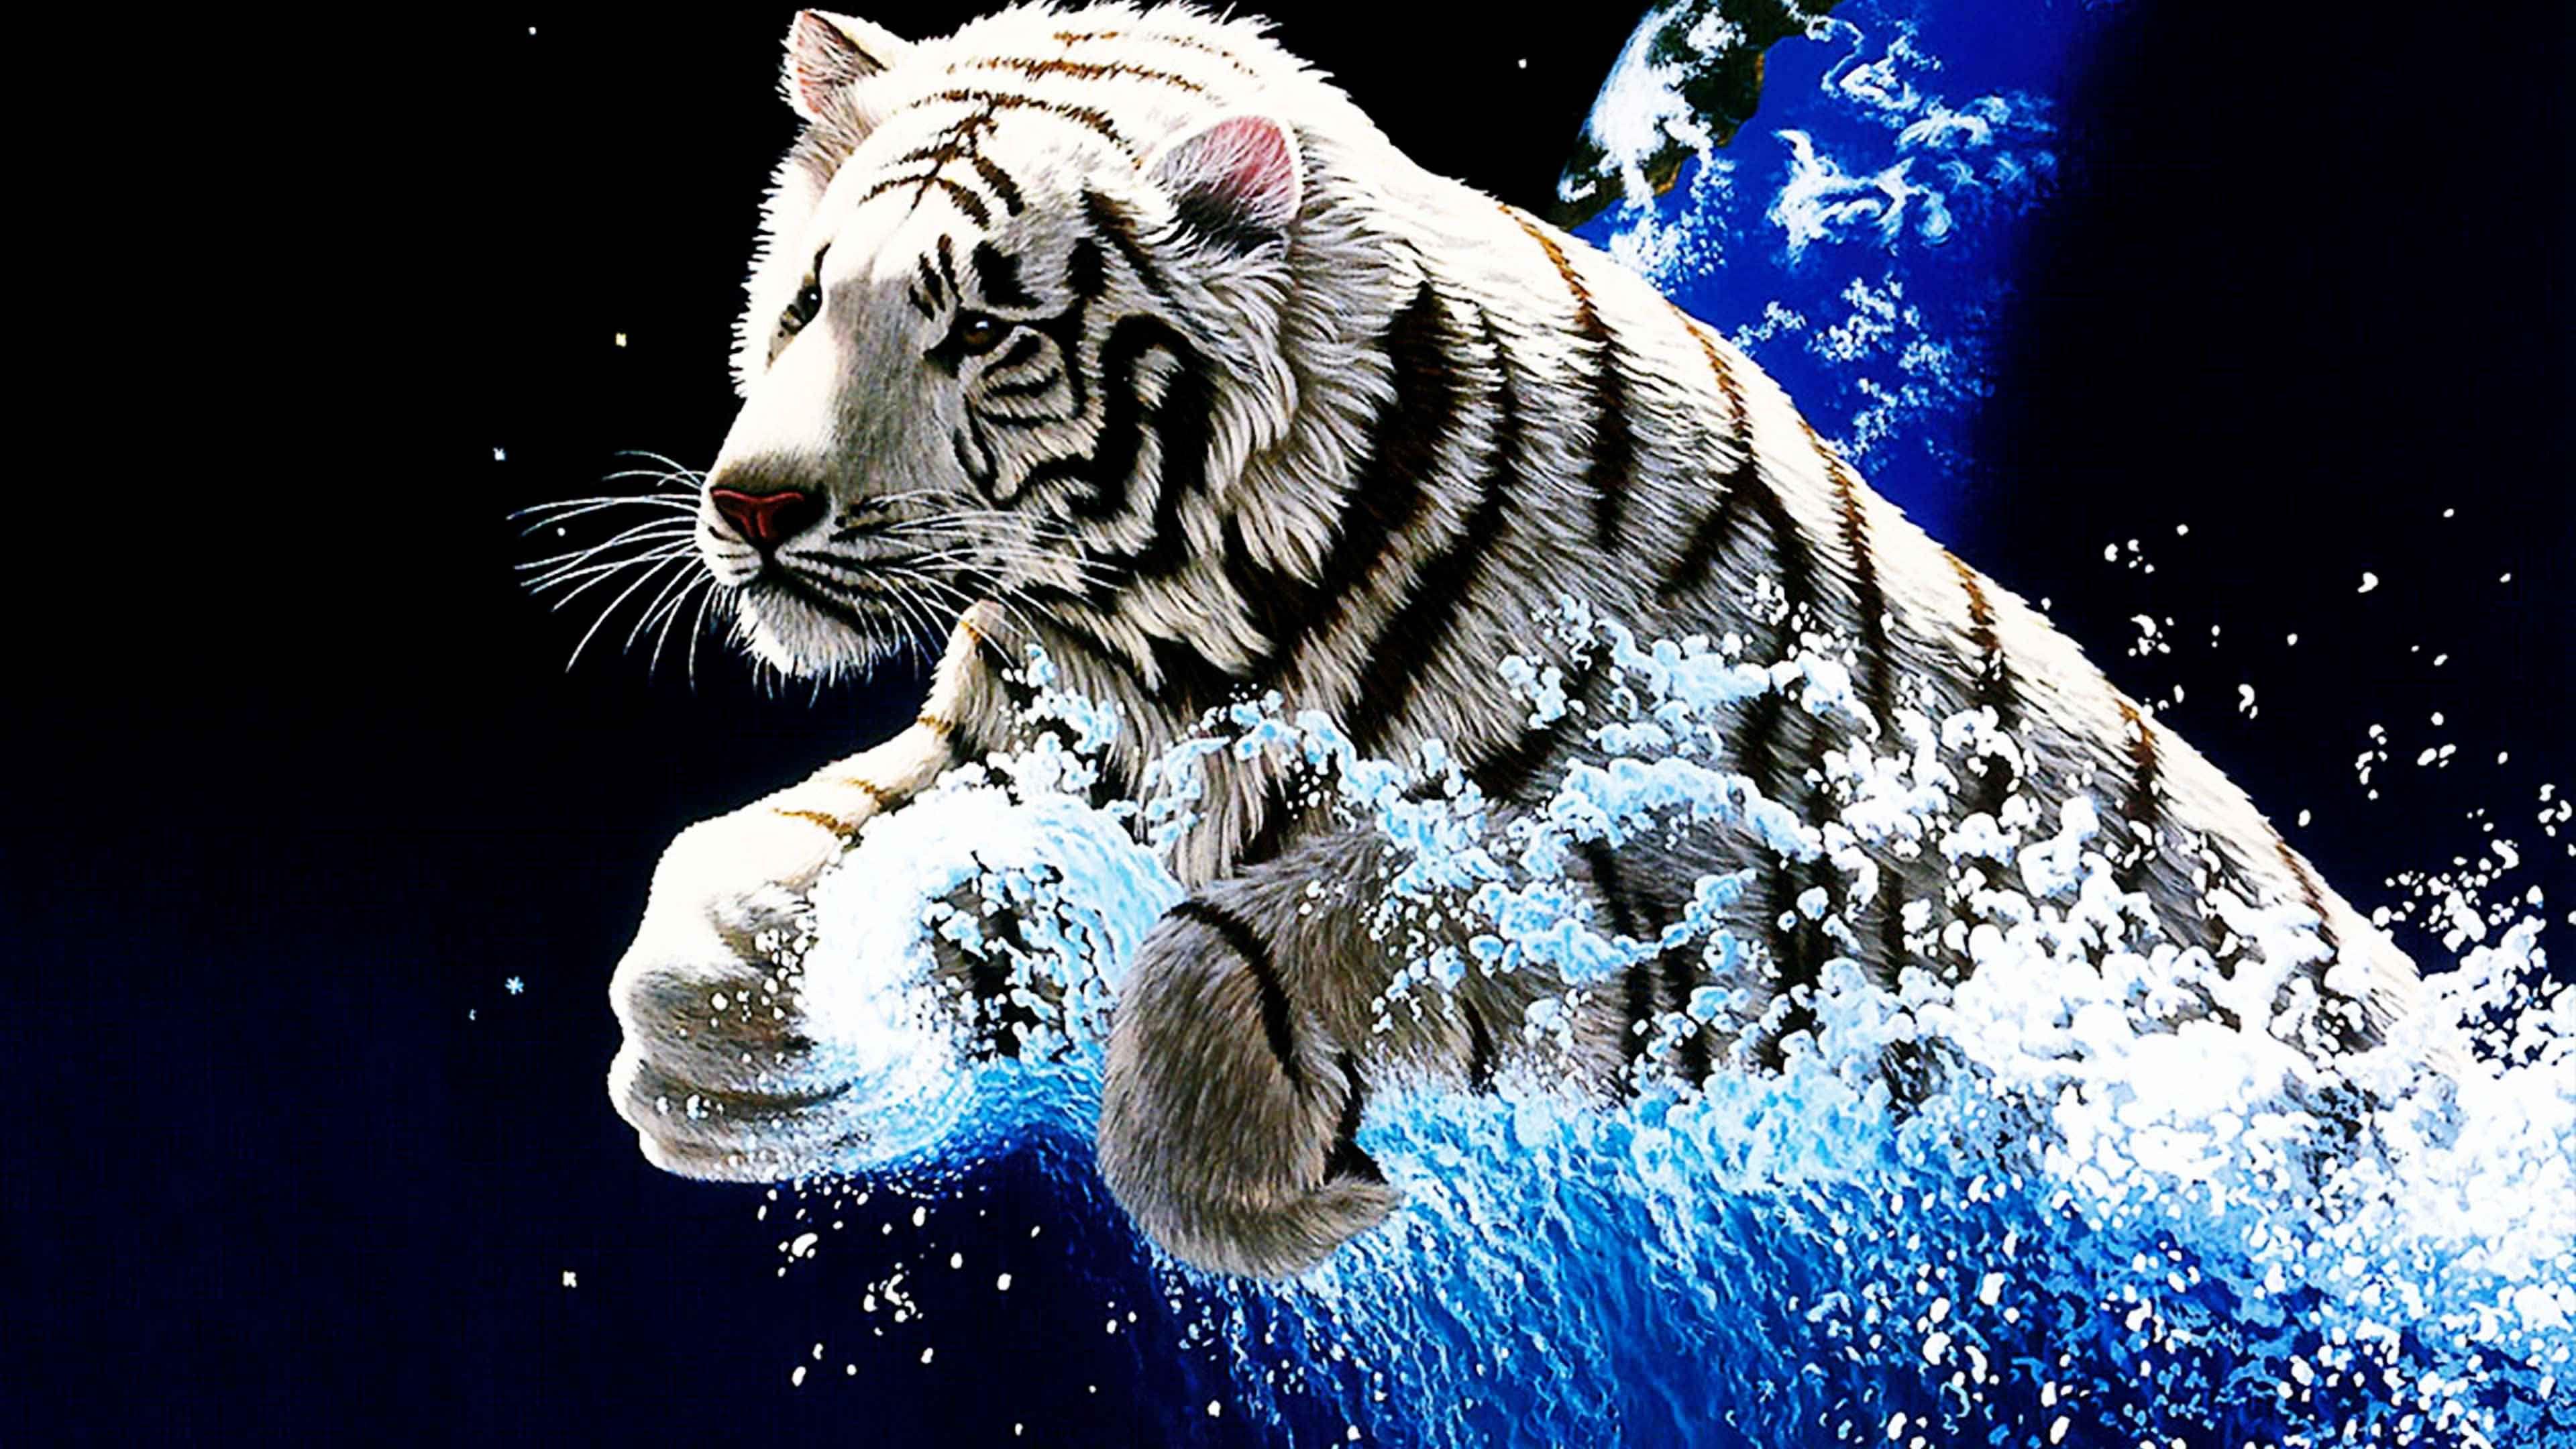 Full Hd Android Tiger Wallpaper